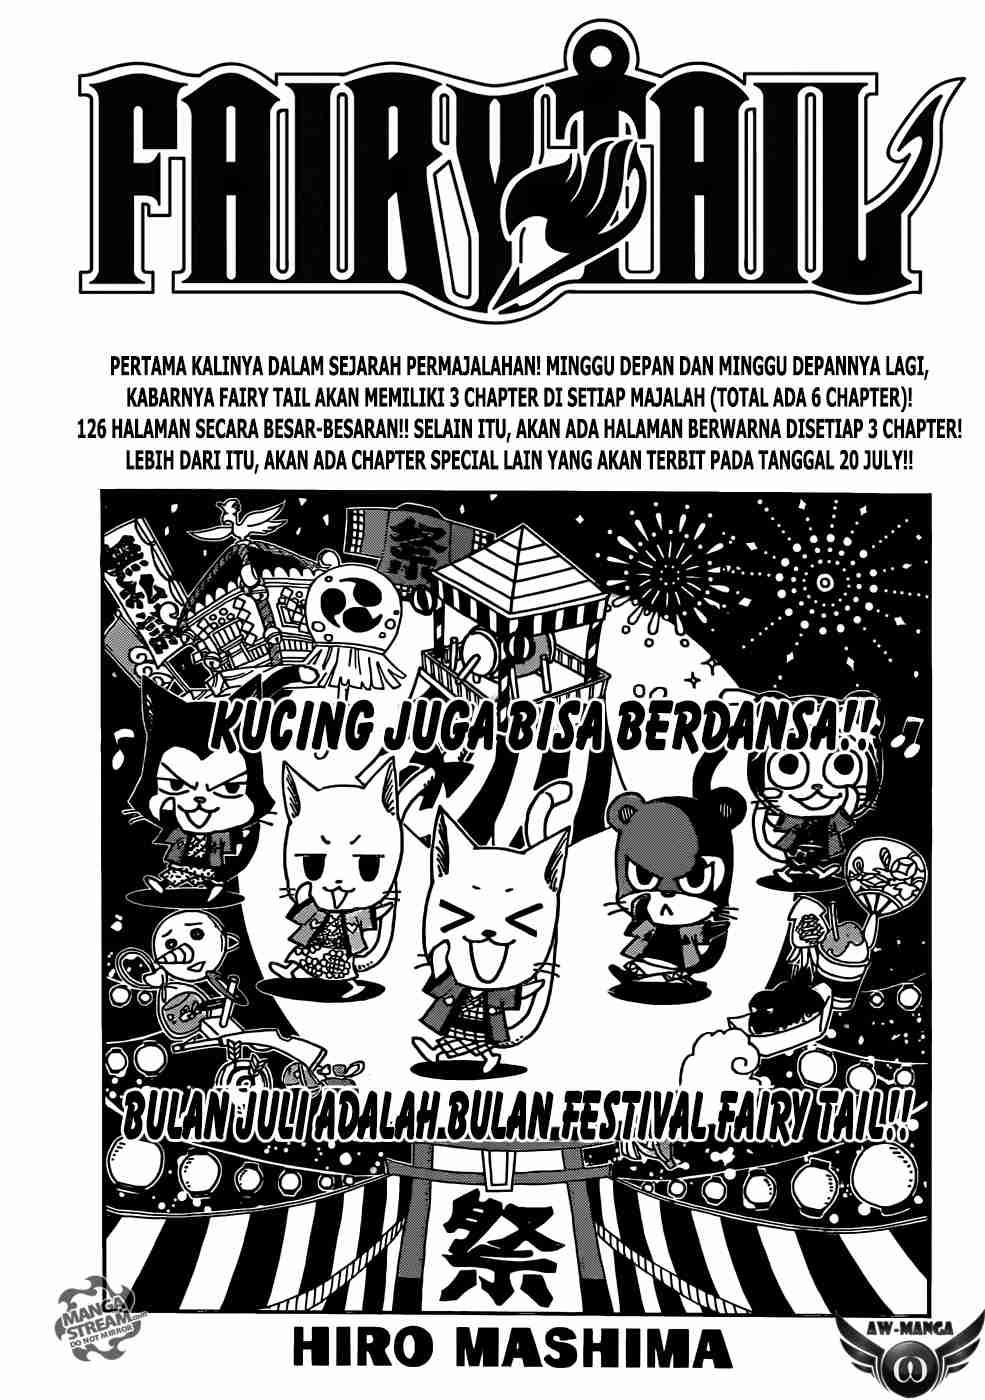 Komik fairy tail 337 - rencana emas 338 Indonesia fairy tail 337 - rencana emas Terbaru 1|Baca Manga Komik Indonesia|Mangacan